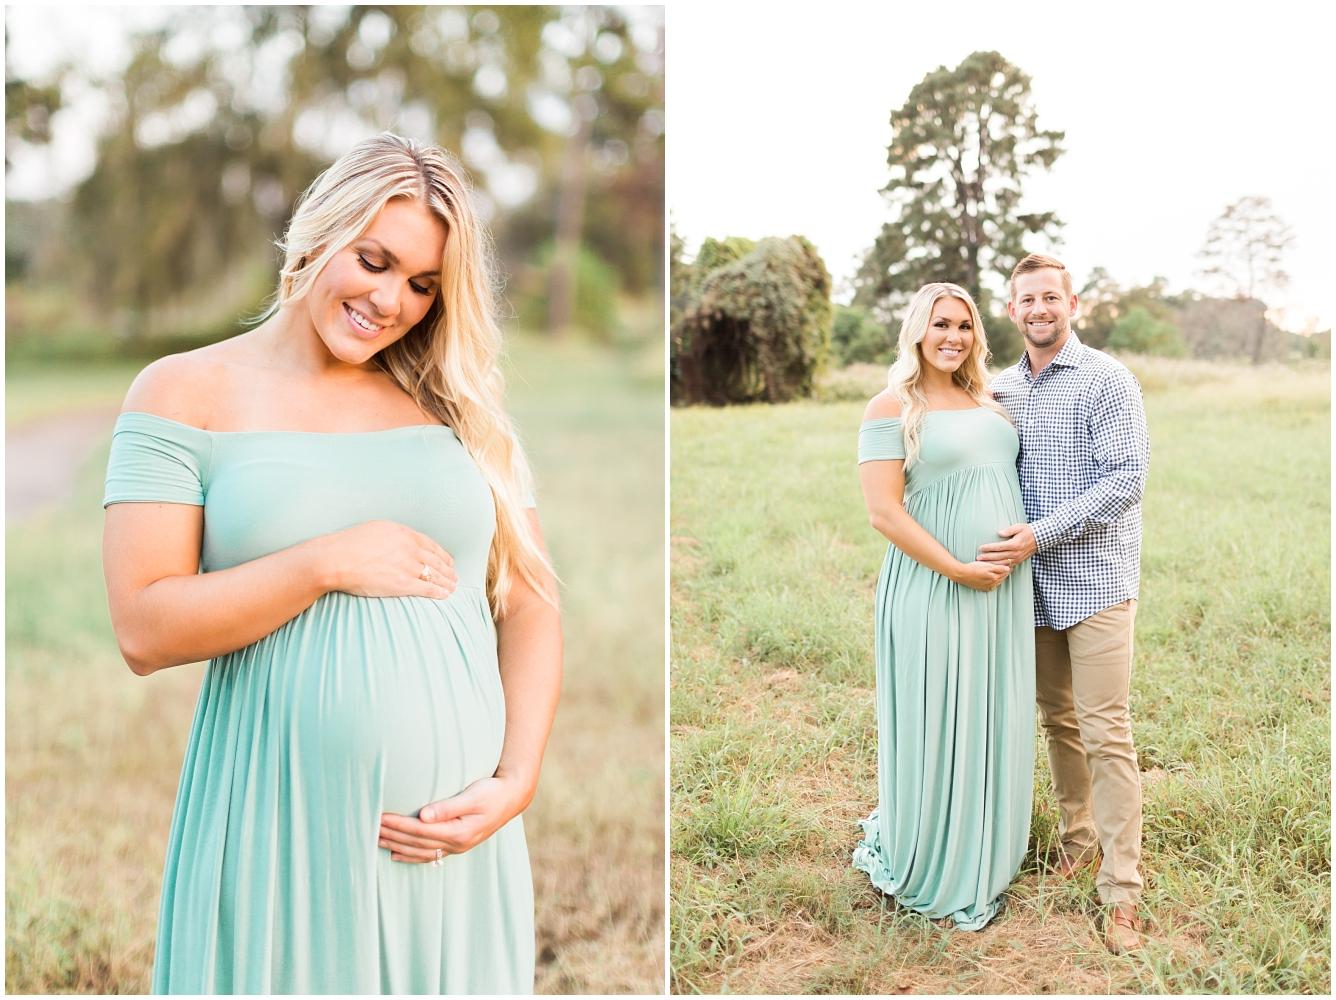 cypress-tx-maternity-photographer-22